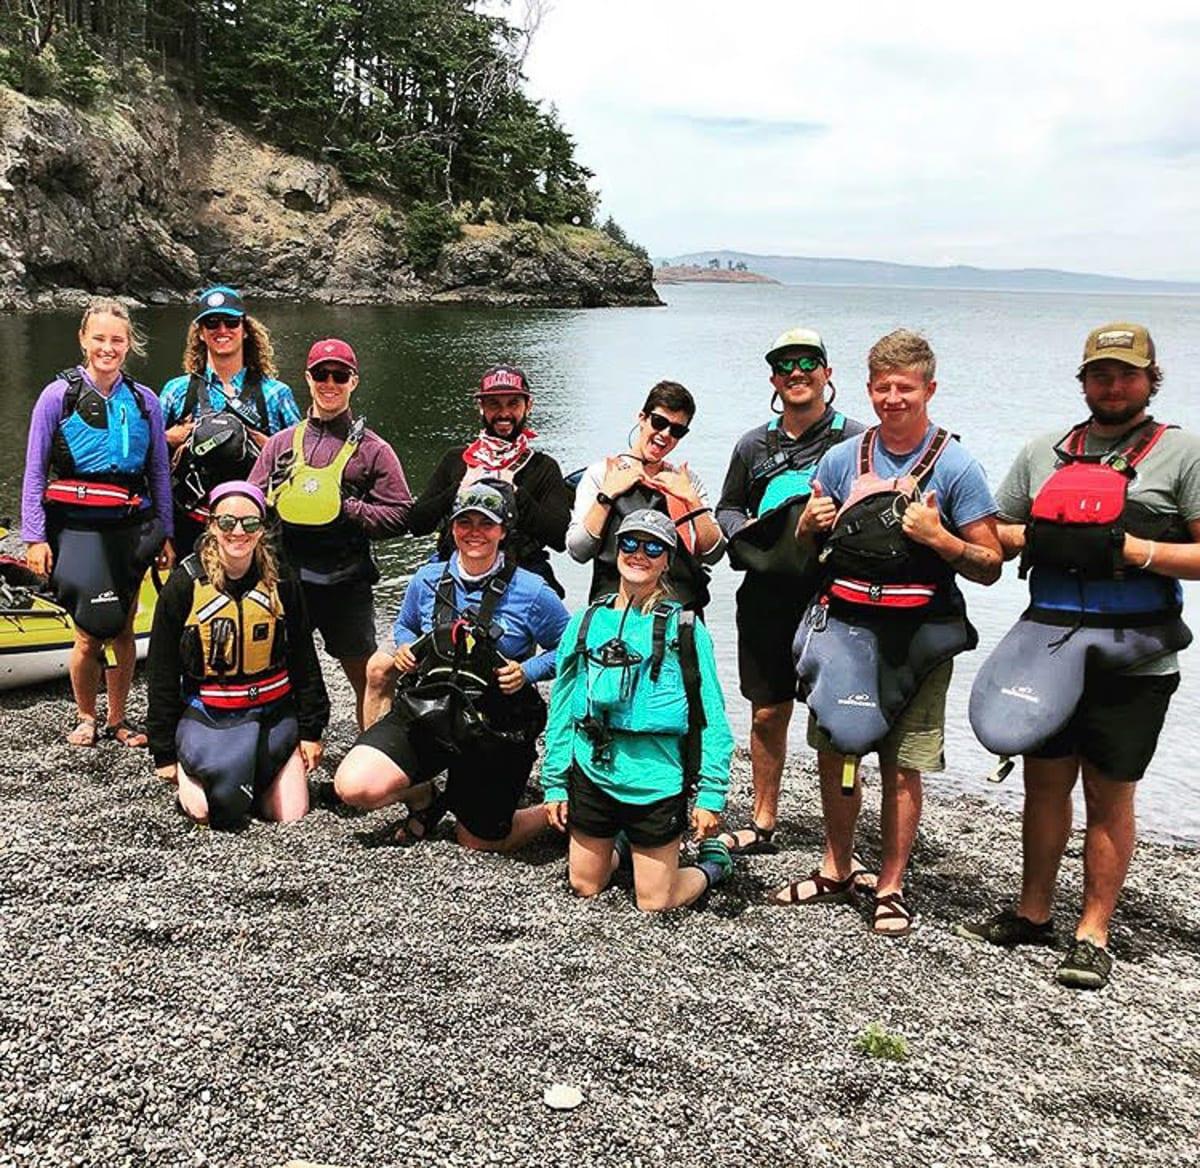 The Crystal Seas Kayaking Team